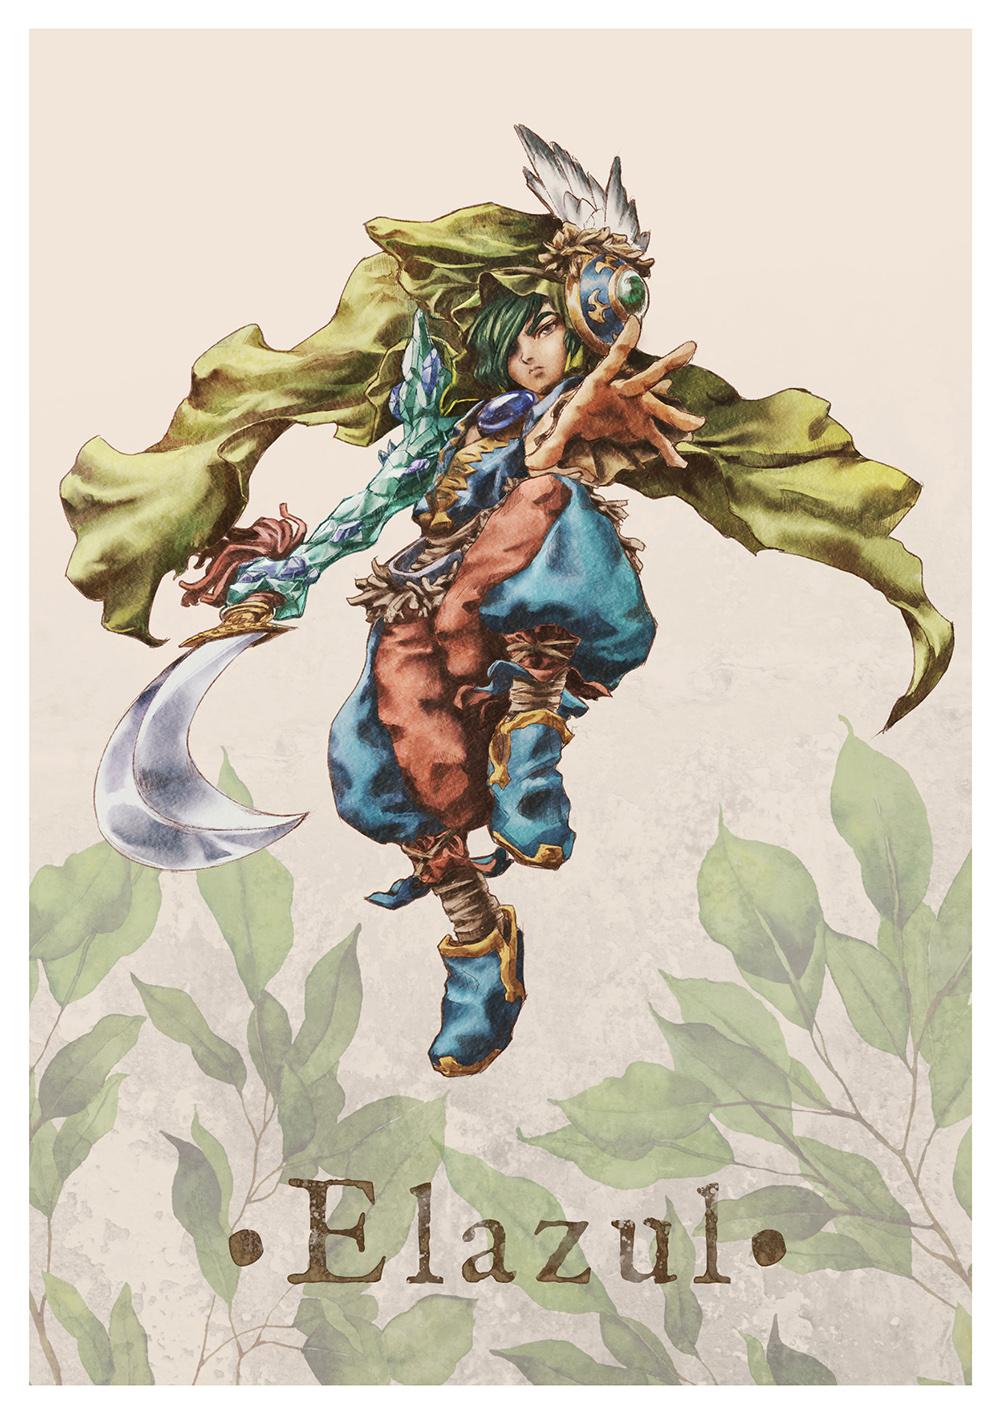 Paola Tuazon - 聖剣伝説 Seiken Densetsu: Legend of Mana - 瑠璃 Jumi Knight Elazul (Lapiz Lazuli) Male Character Fanart PS1 JRPG Game